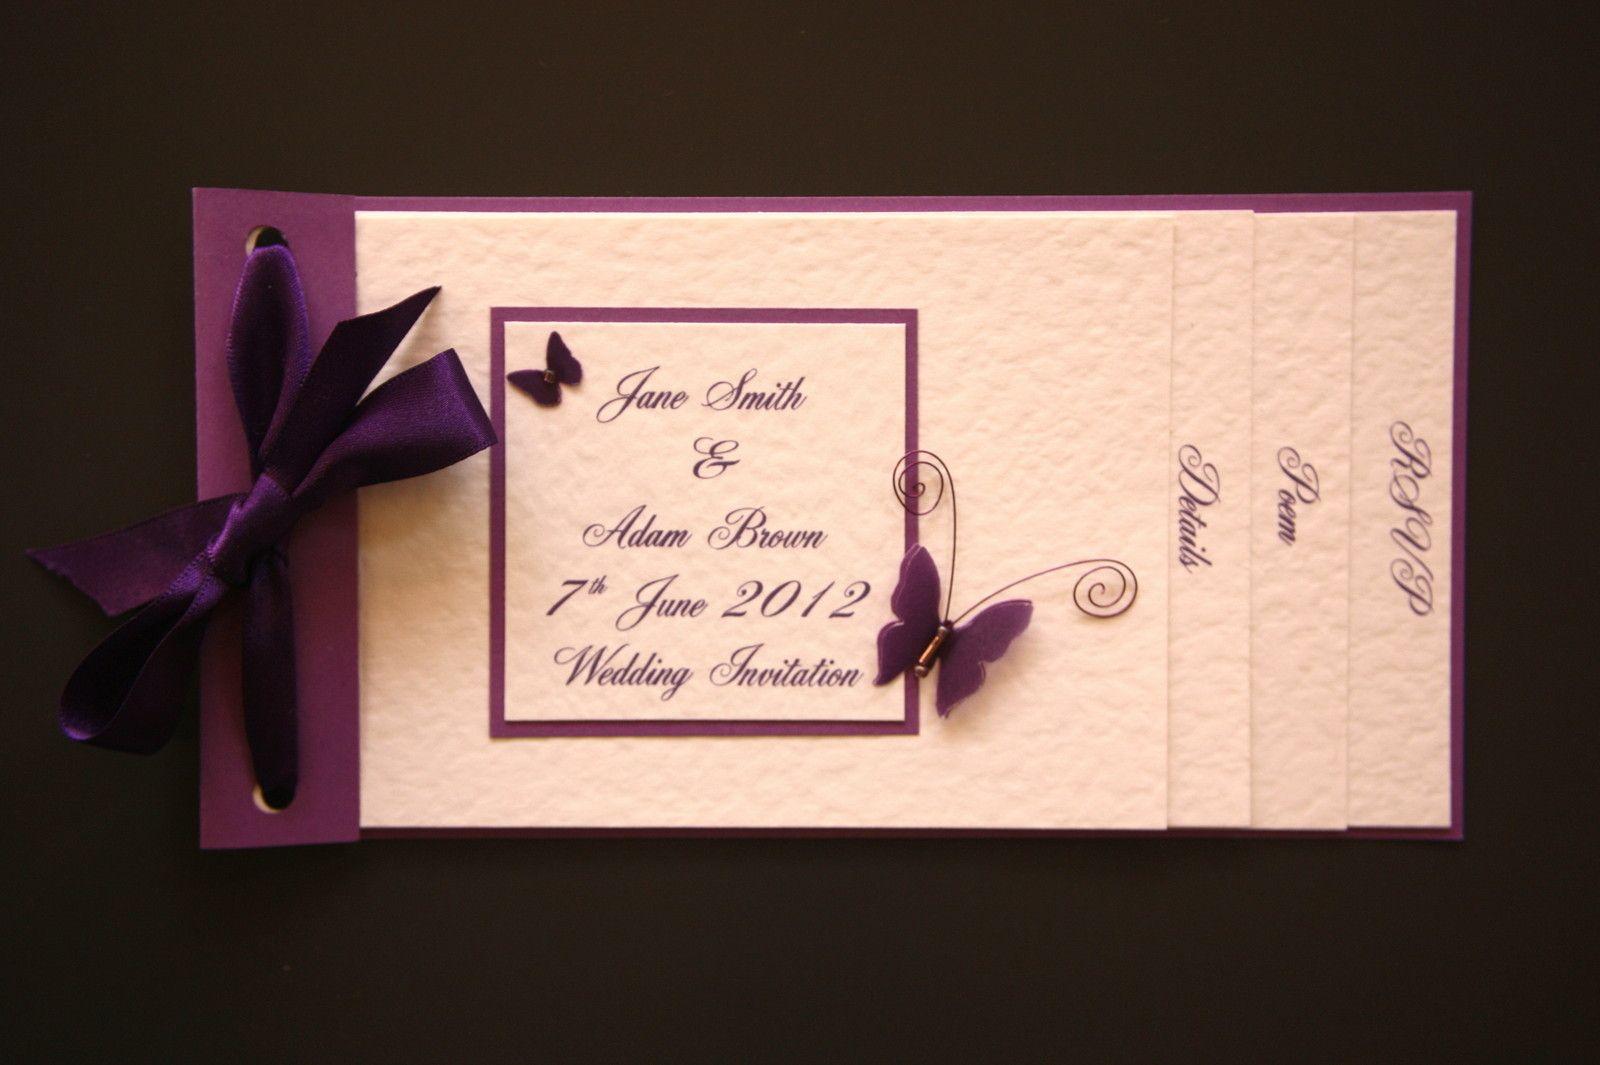 Wedding Invitation Ideas Pinterest: HANDMADE WEDDING INVITATIONS ~BUTTERFLY CHEQUE BOOK STYLE